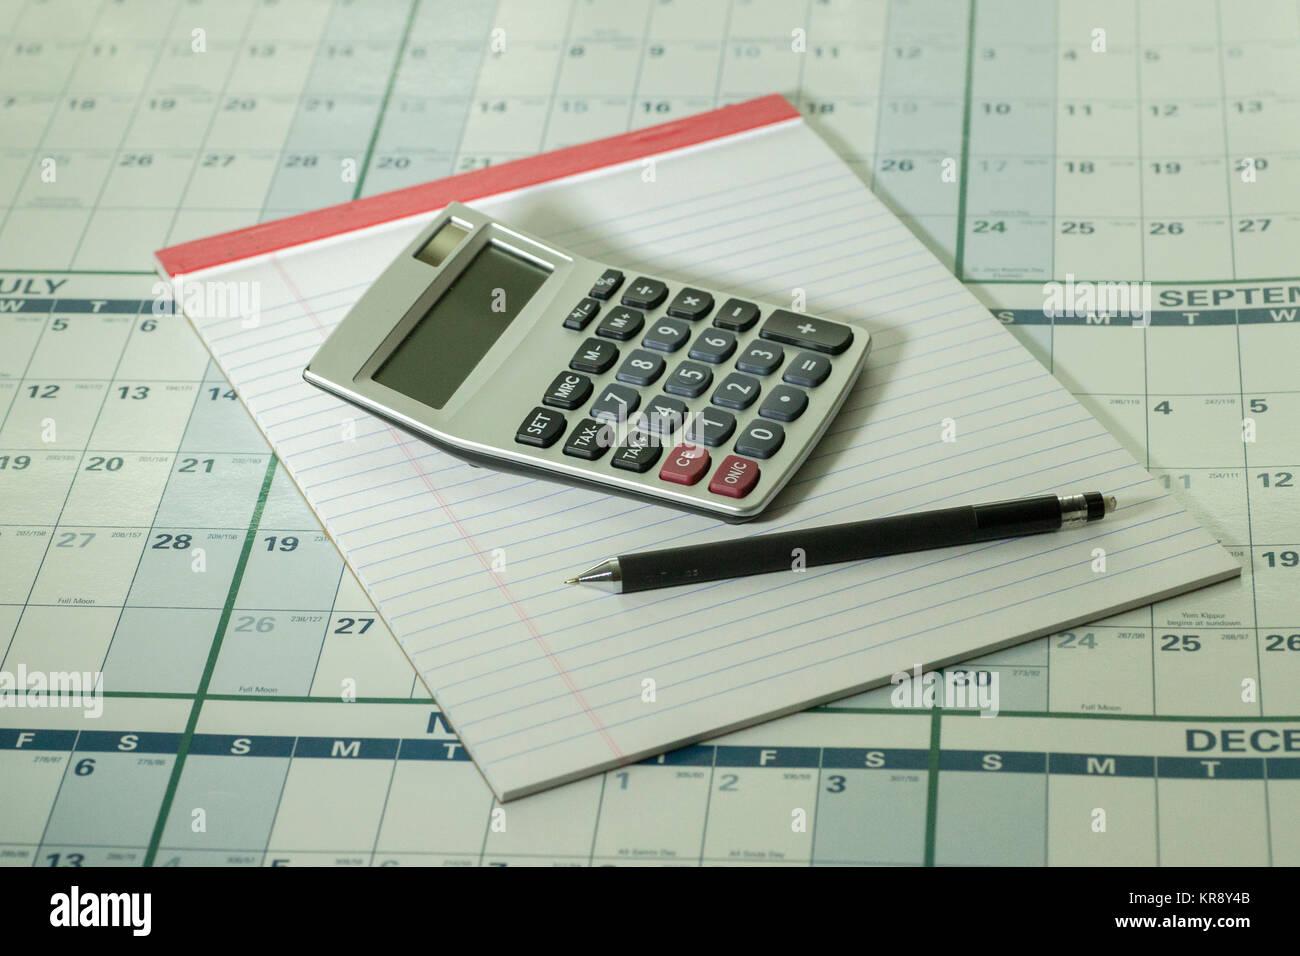 Almohadilla de calculadora y lápiz sobre calendario antecedentes Imagen De Stock